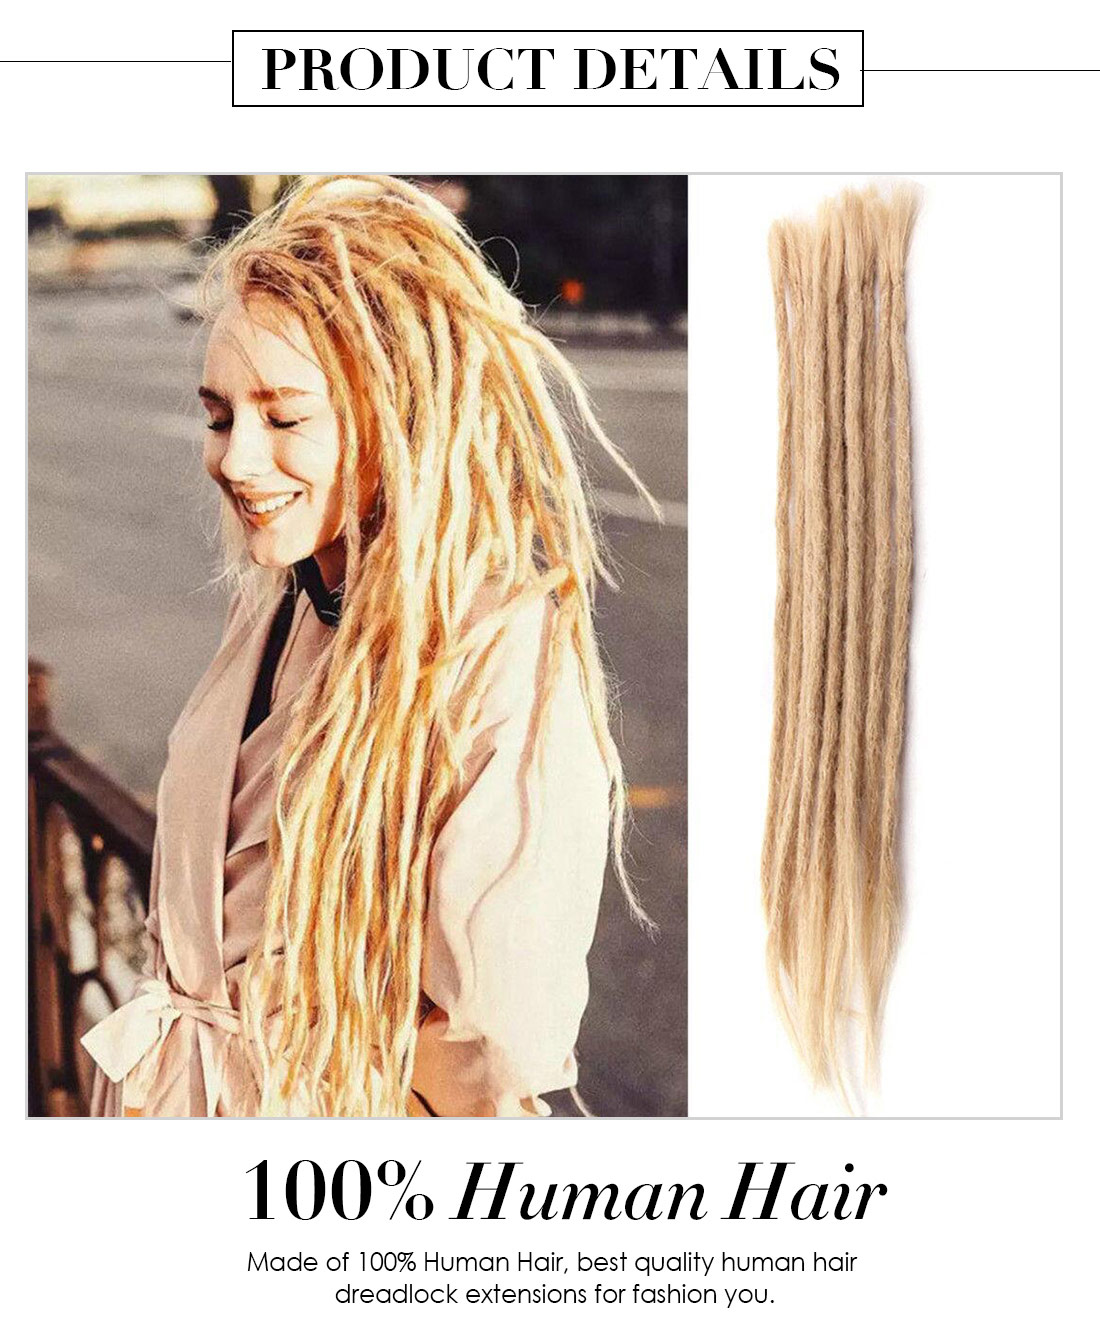 Hair Dreadlock Extensions